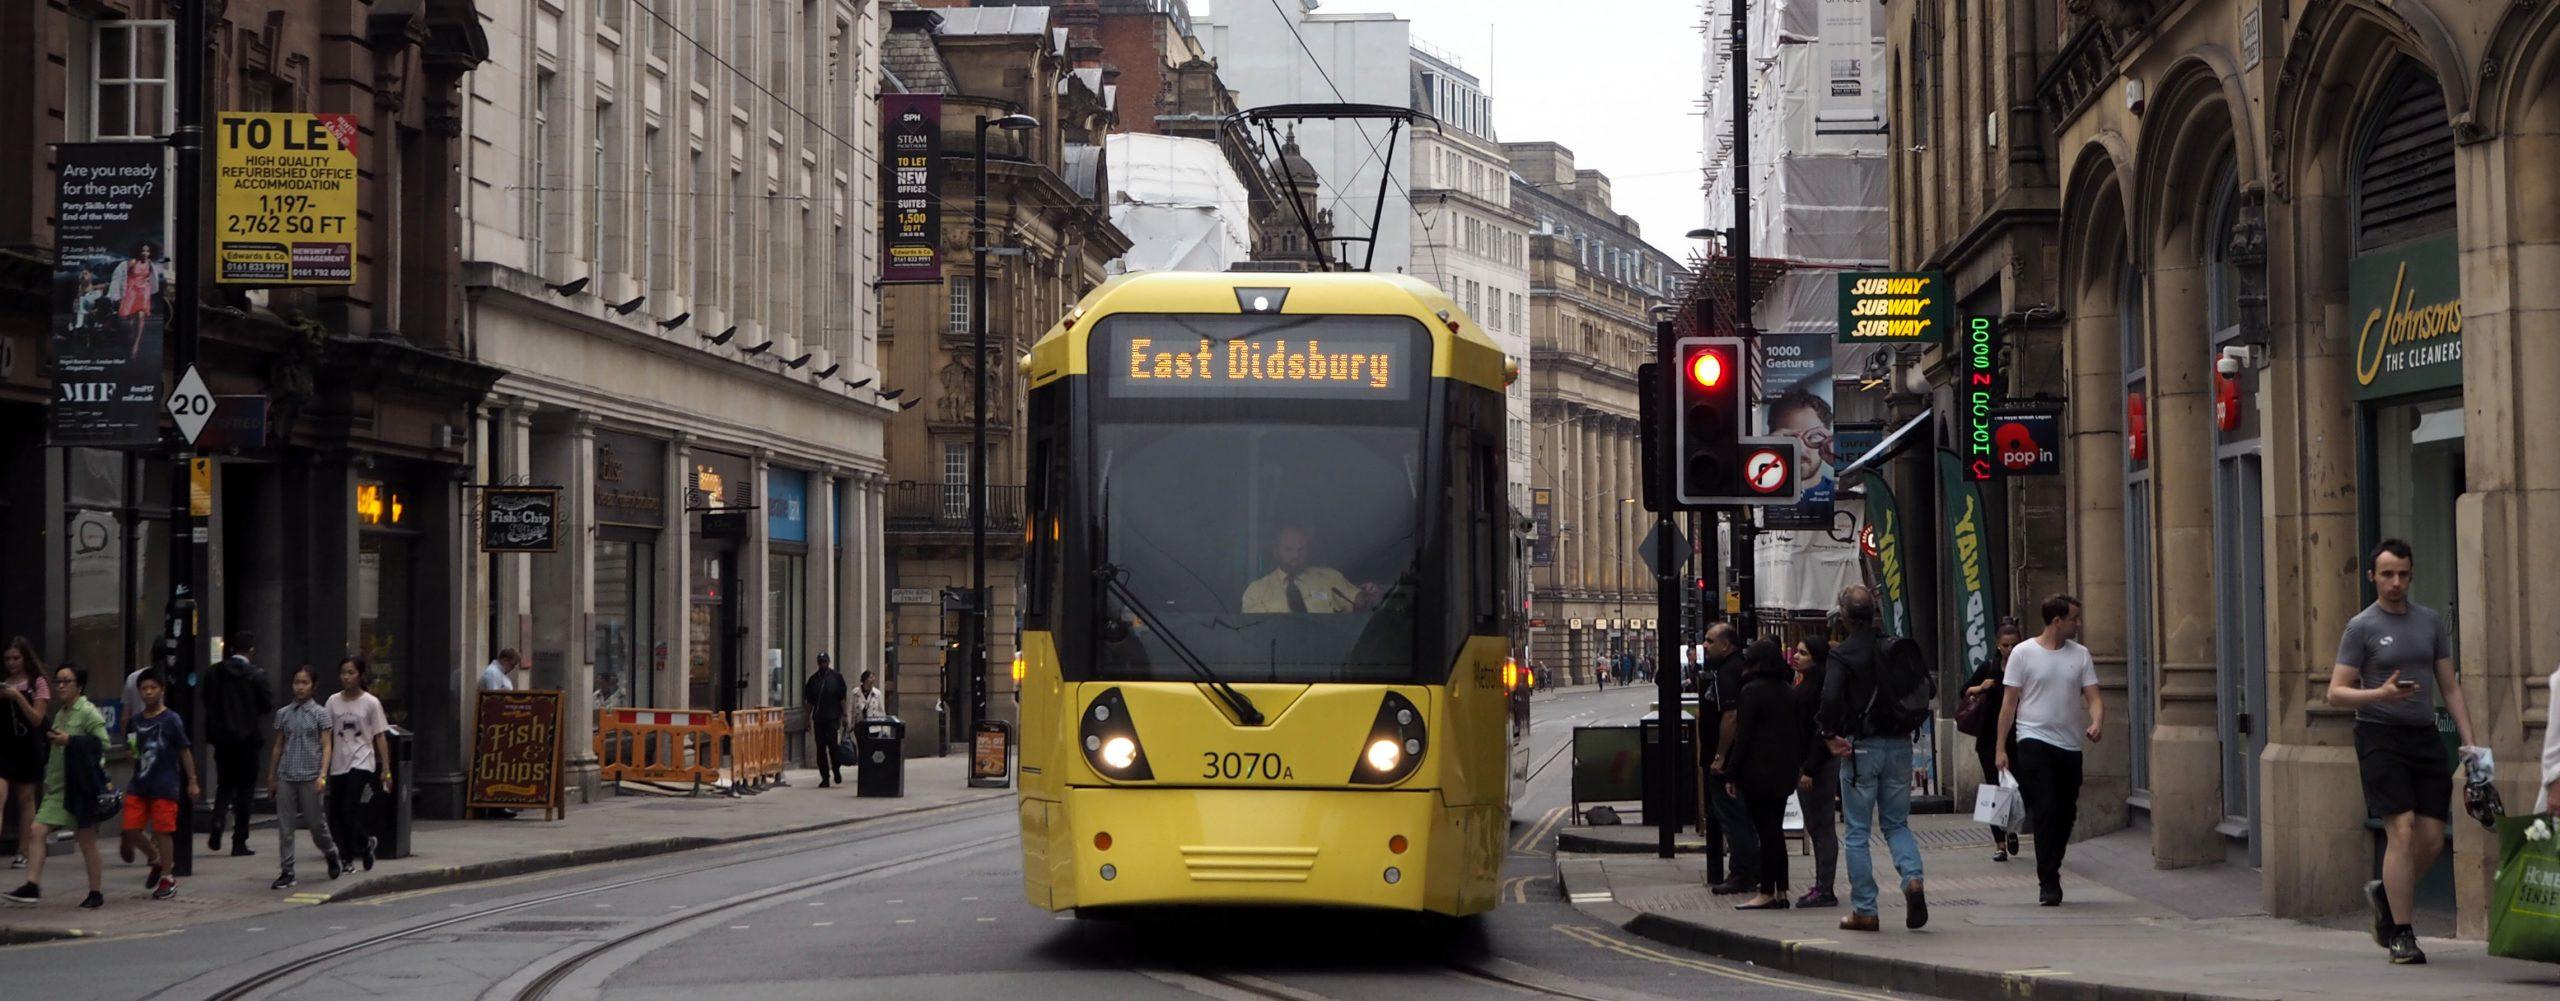 TramForward backs demand for more resources for light rail